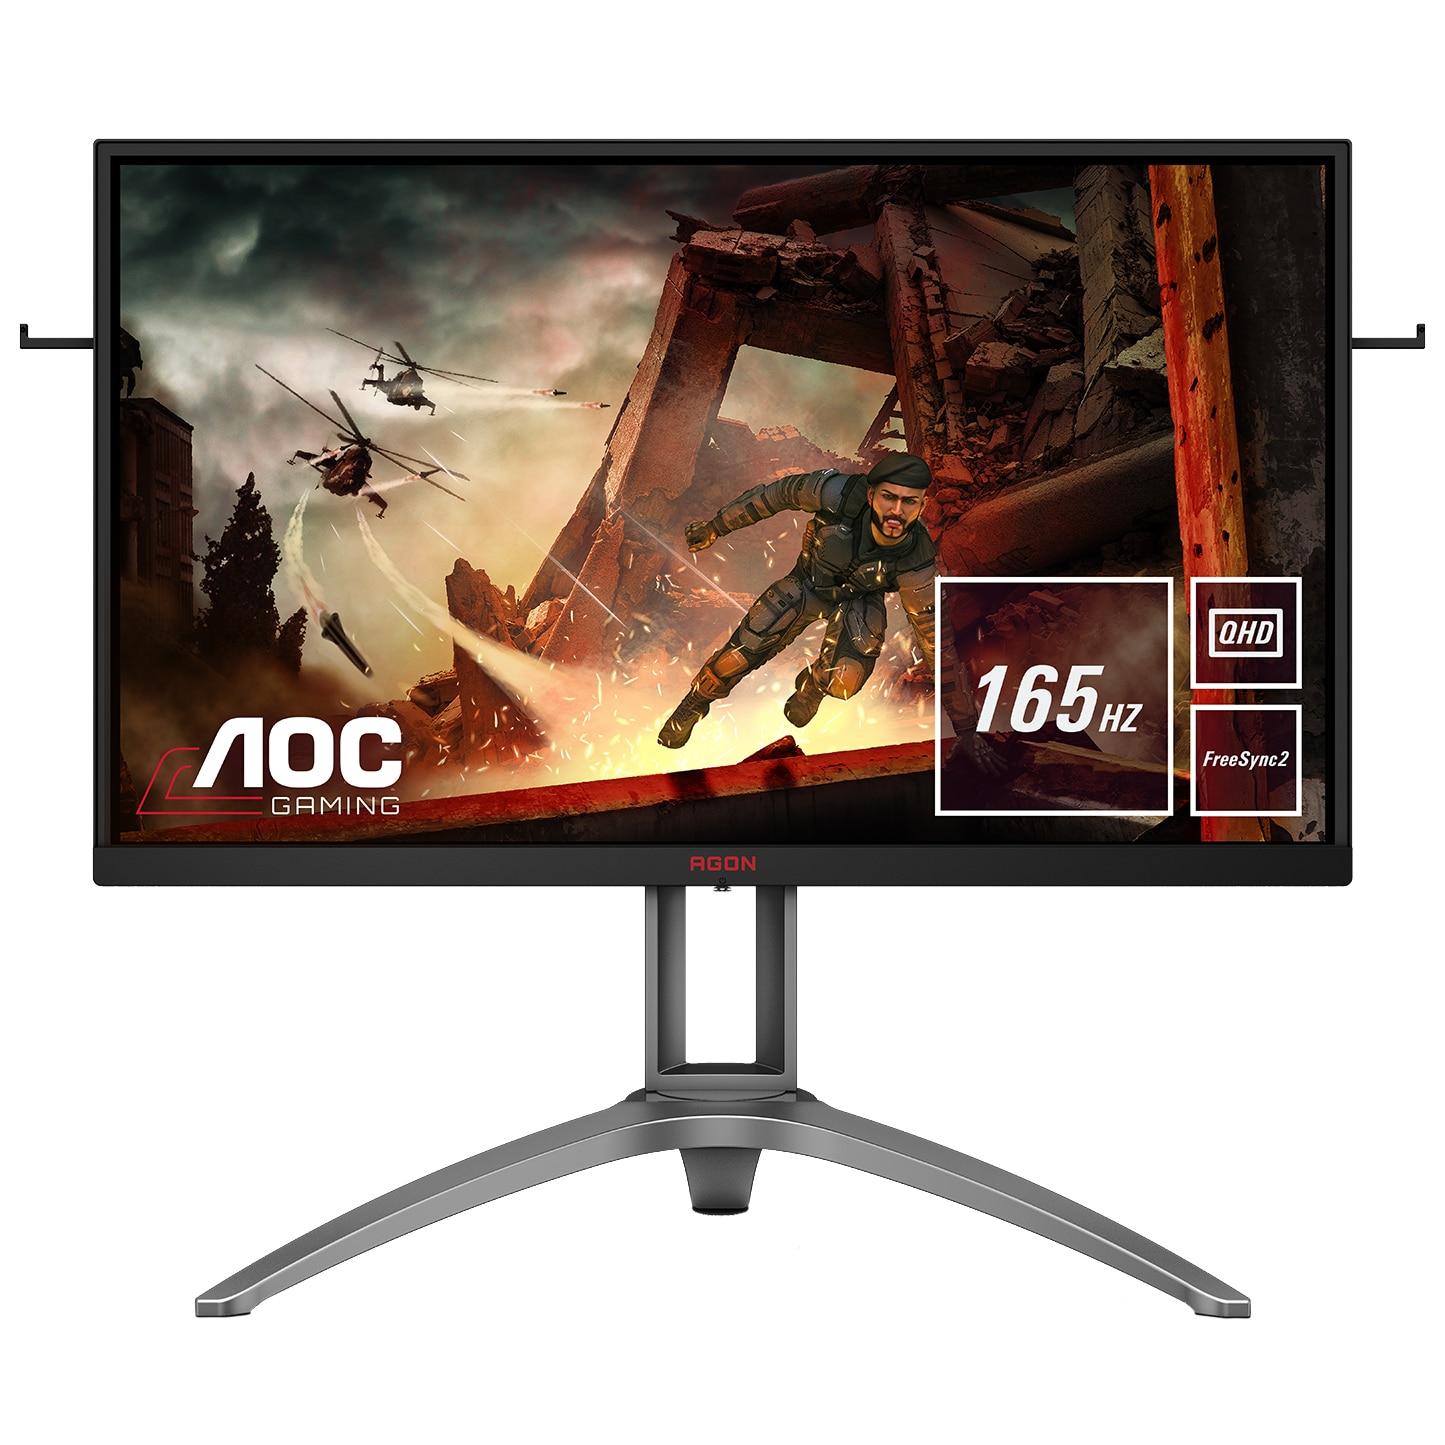 "Fotografie Monitor gaming LED VA AOC AGON 3 27"", WQHD, Display Port, 165Hz, 1ms, FreeSync 2 HDR, Negru/Rosu"